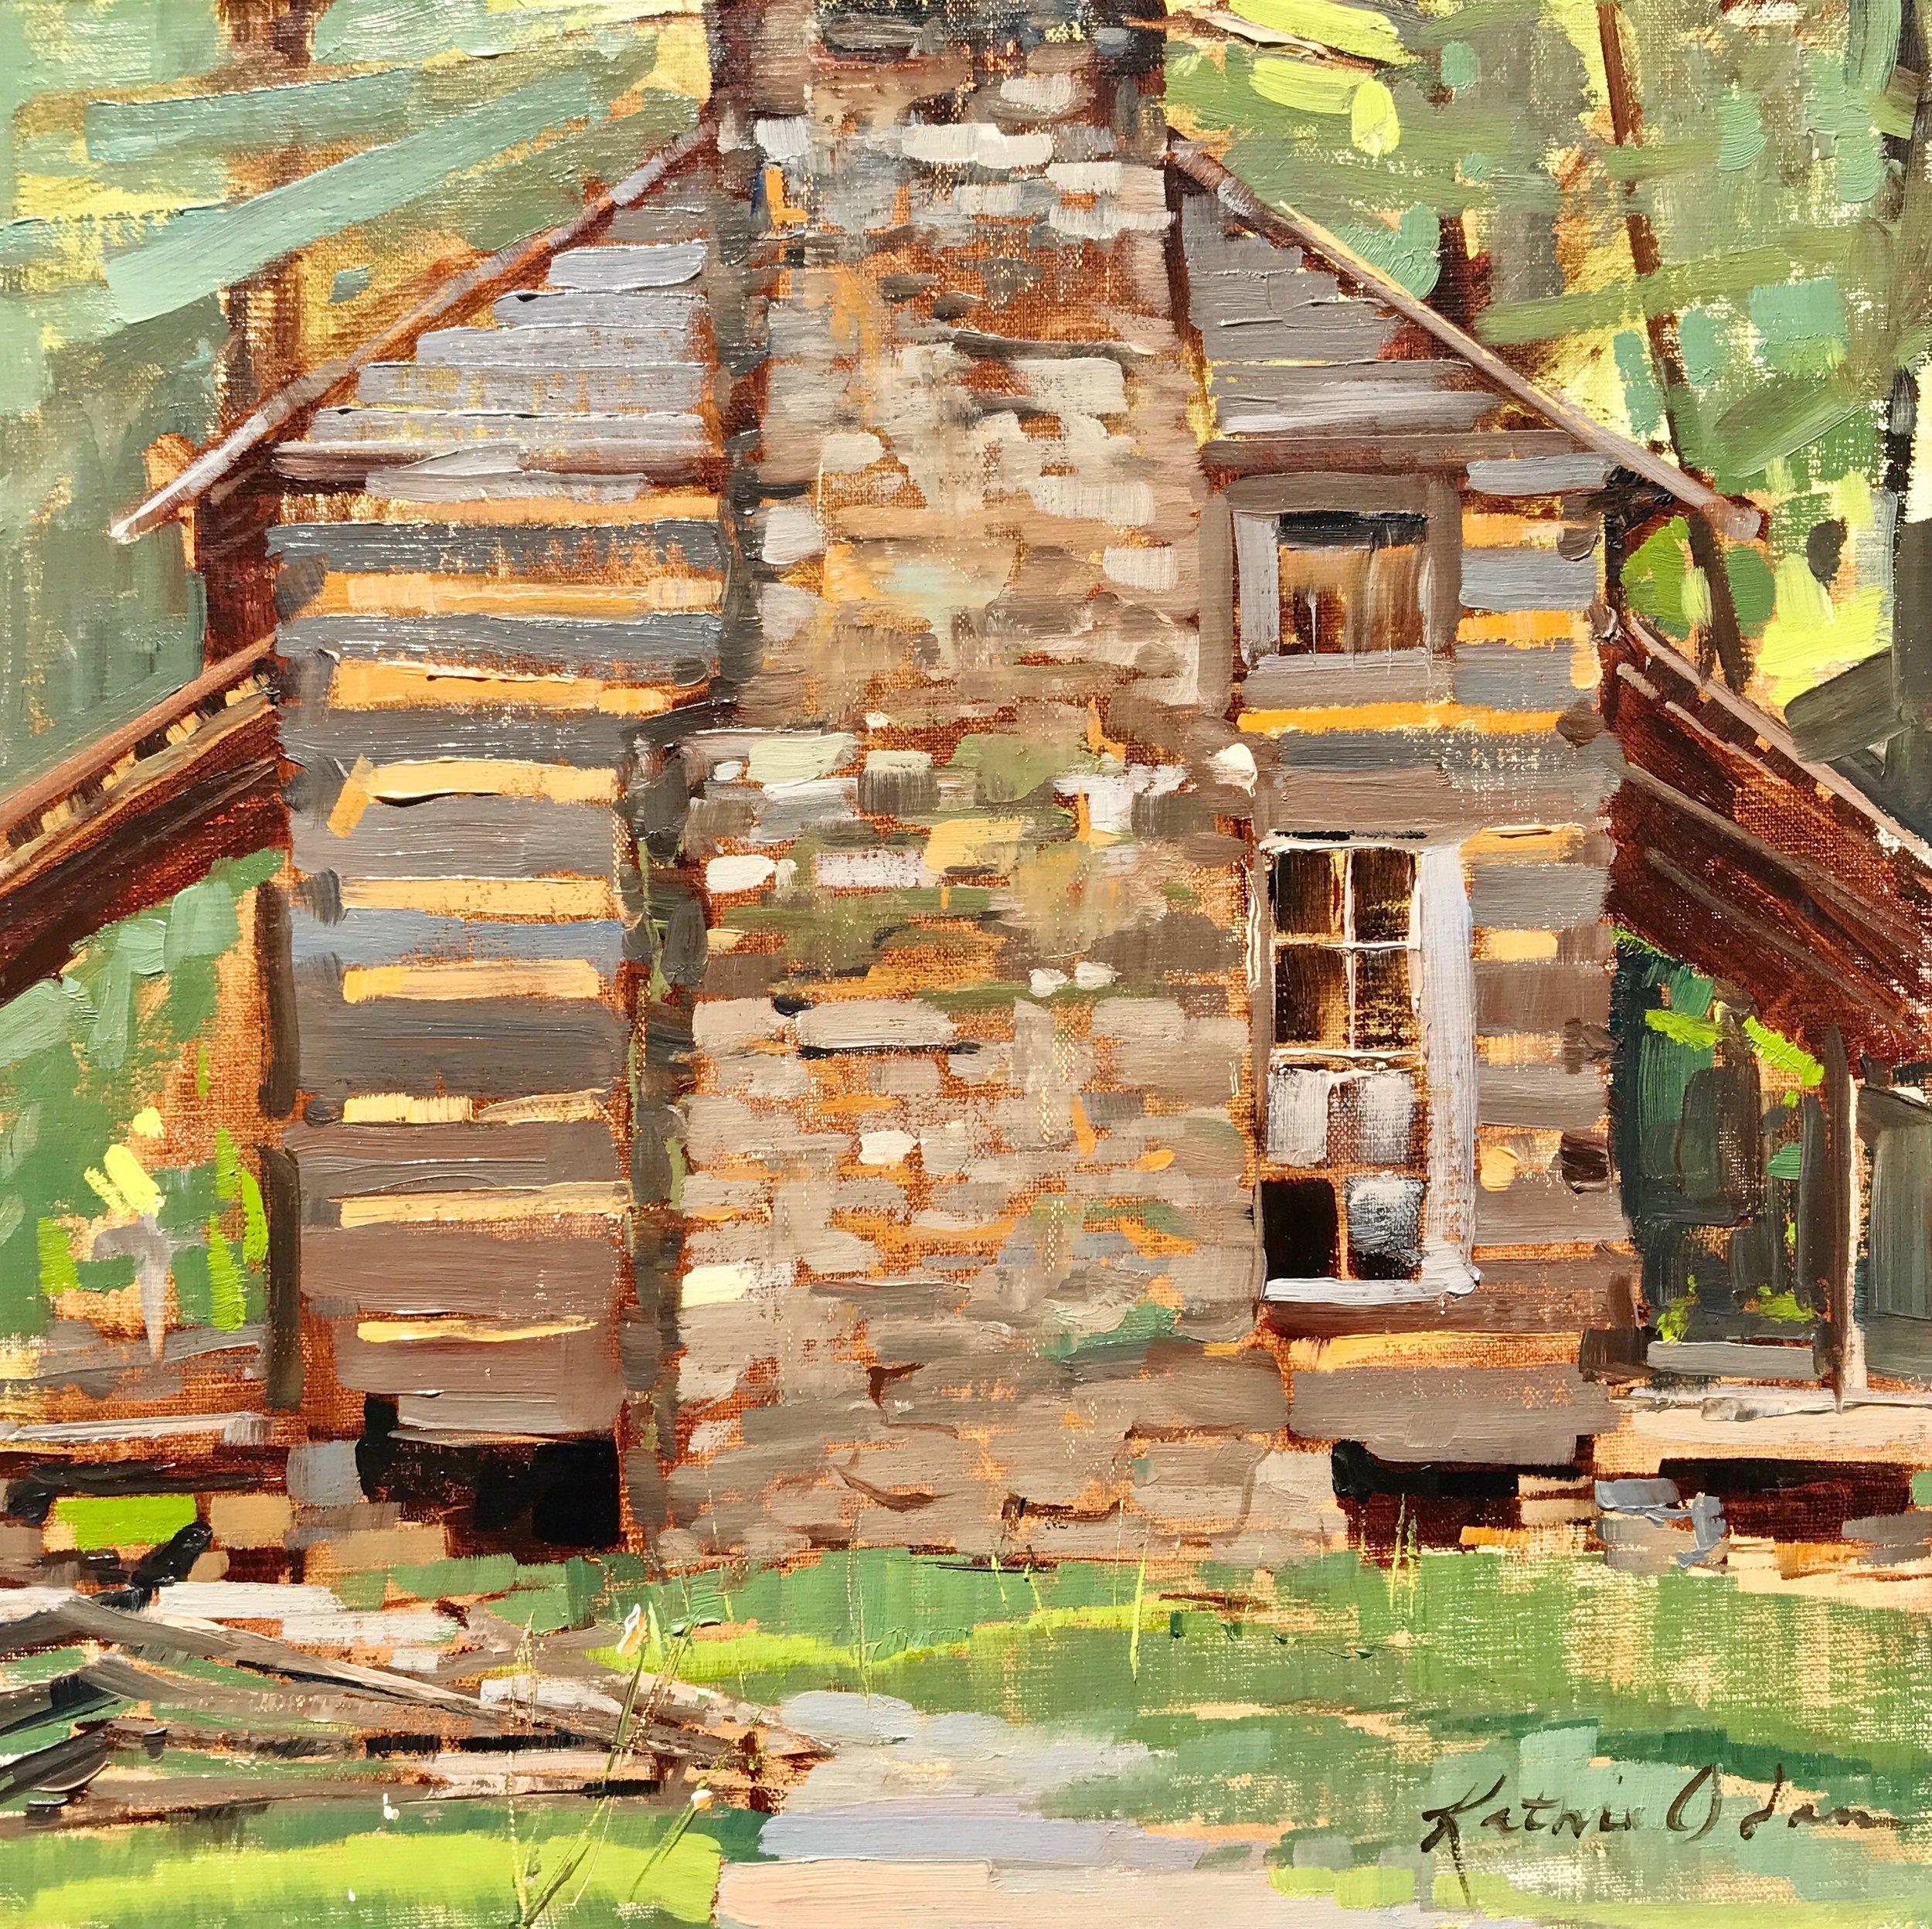 Kathie Odom, Log Some Time